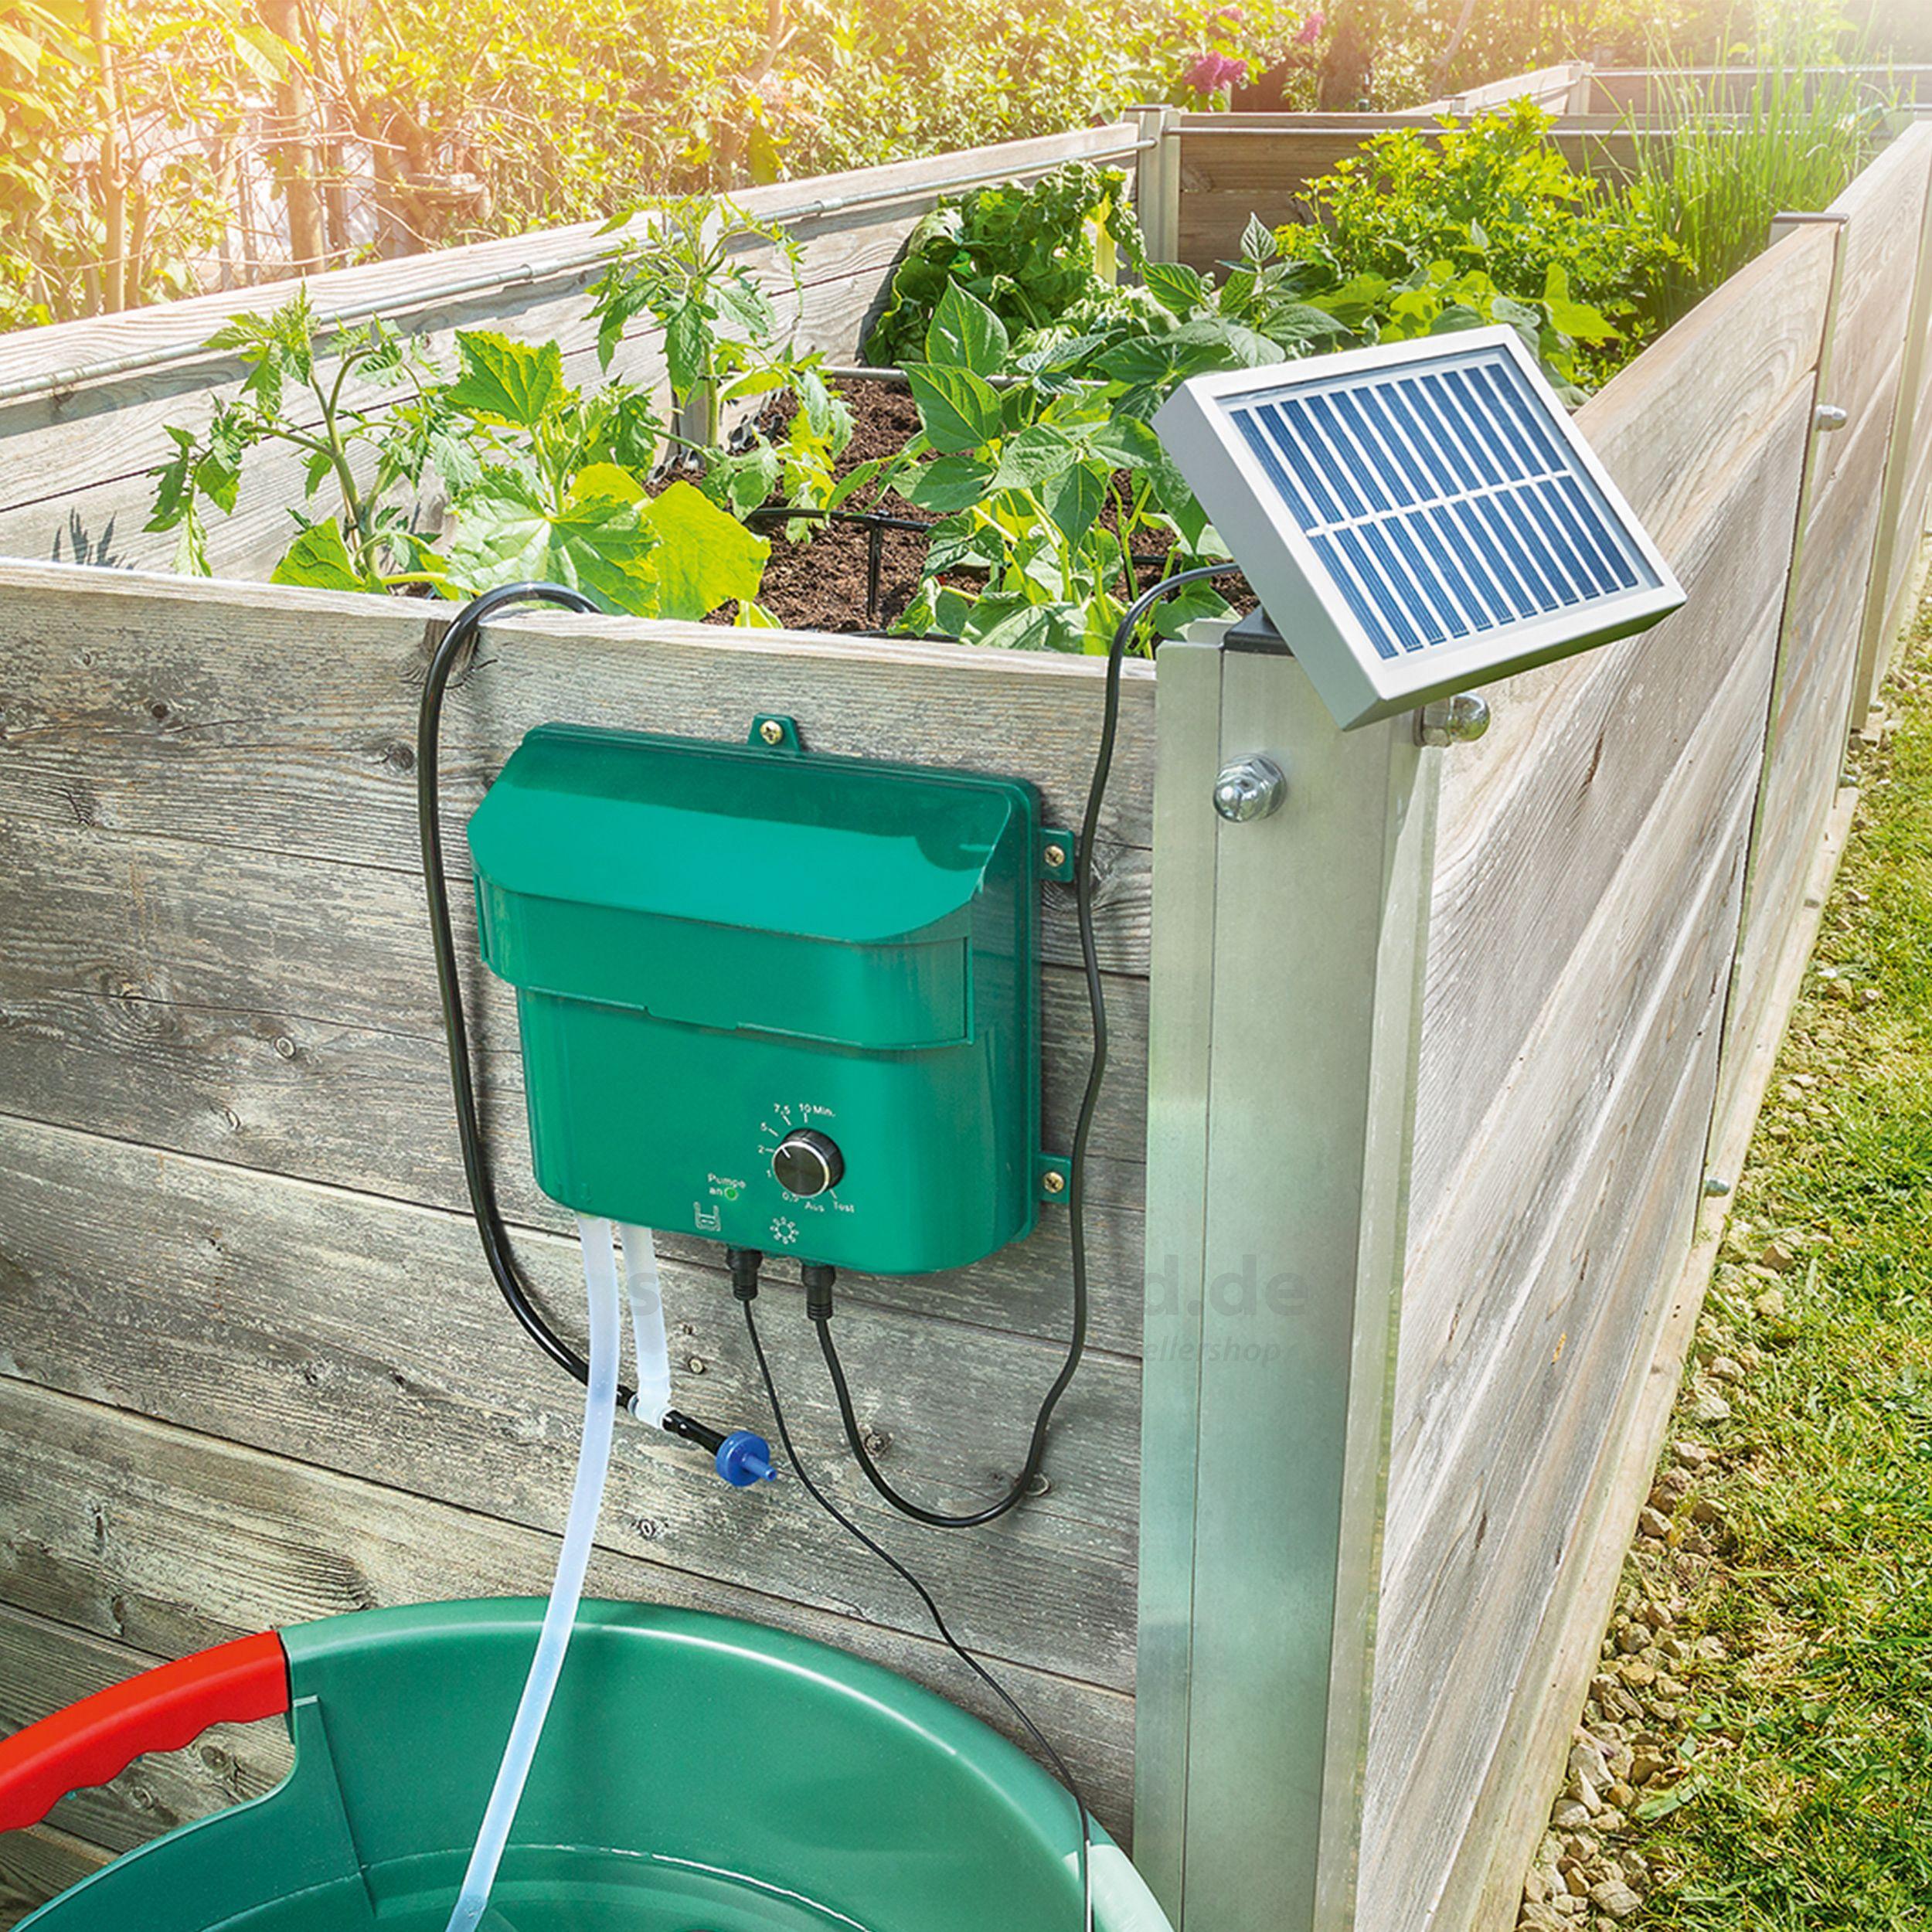 Solar Bewasserungsset Waterdrops Bewasserung Gewachshaus Bewasserung Und Bewasserungssystem